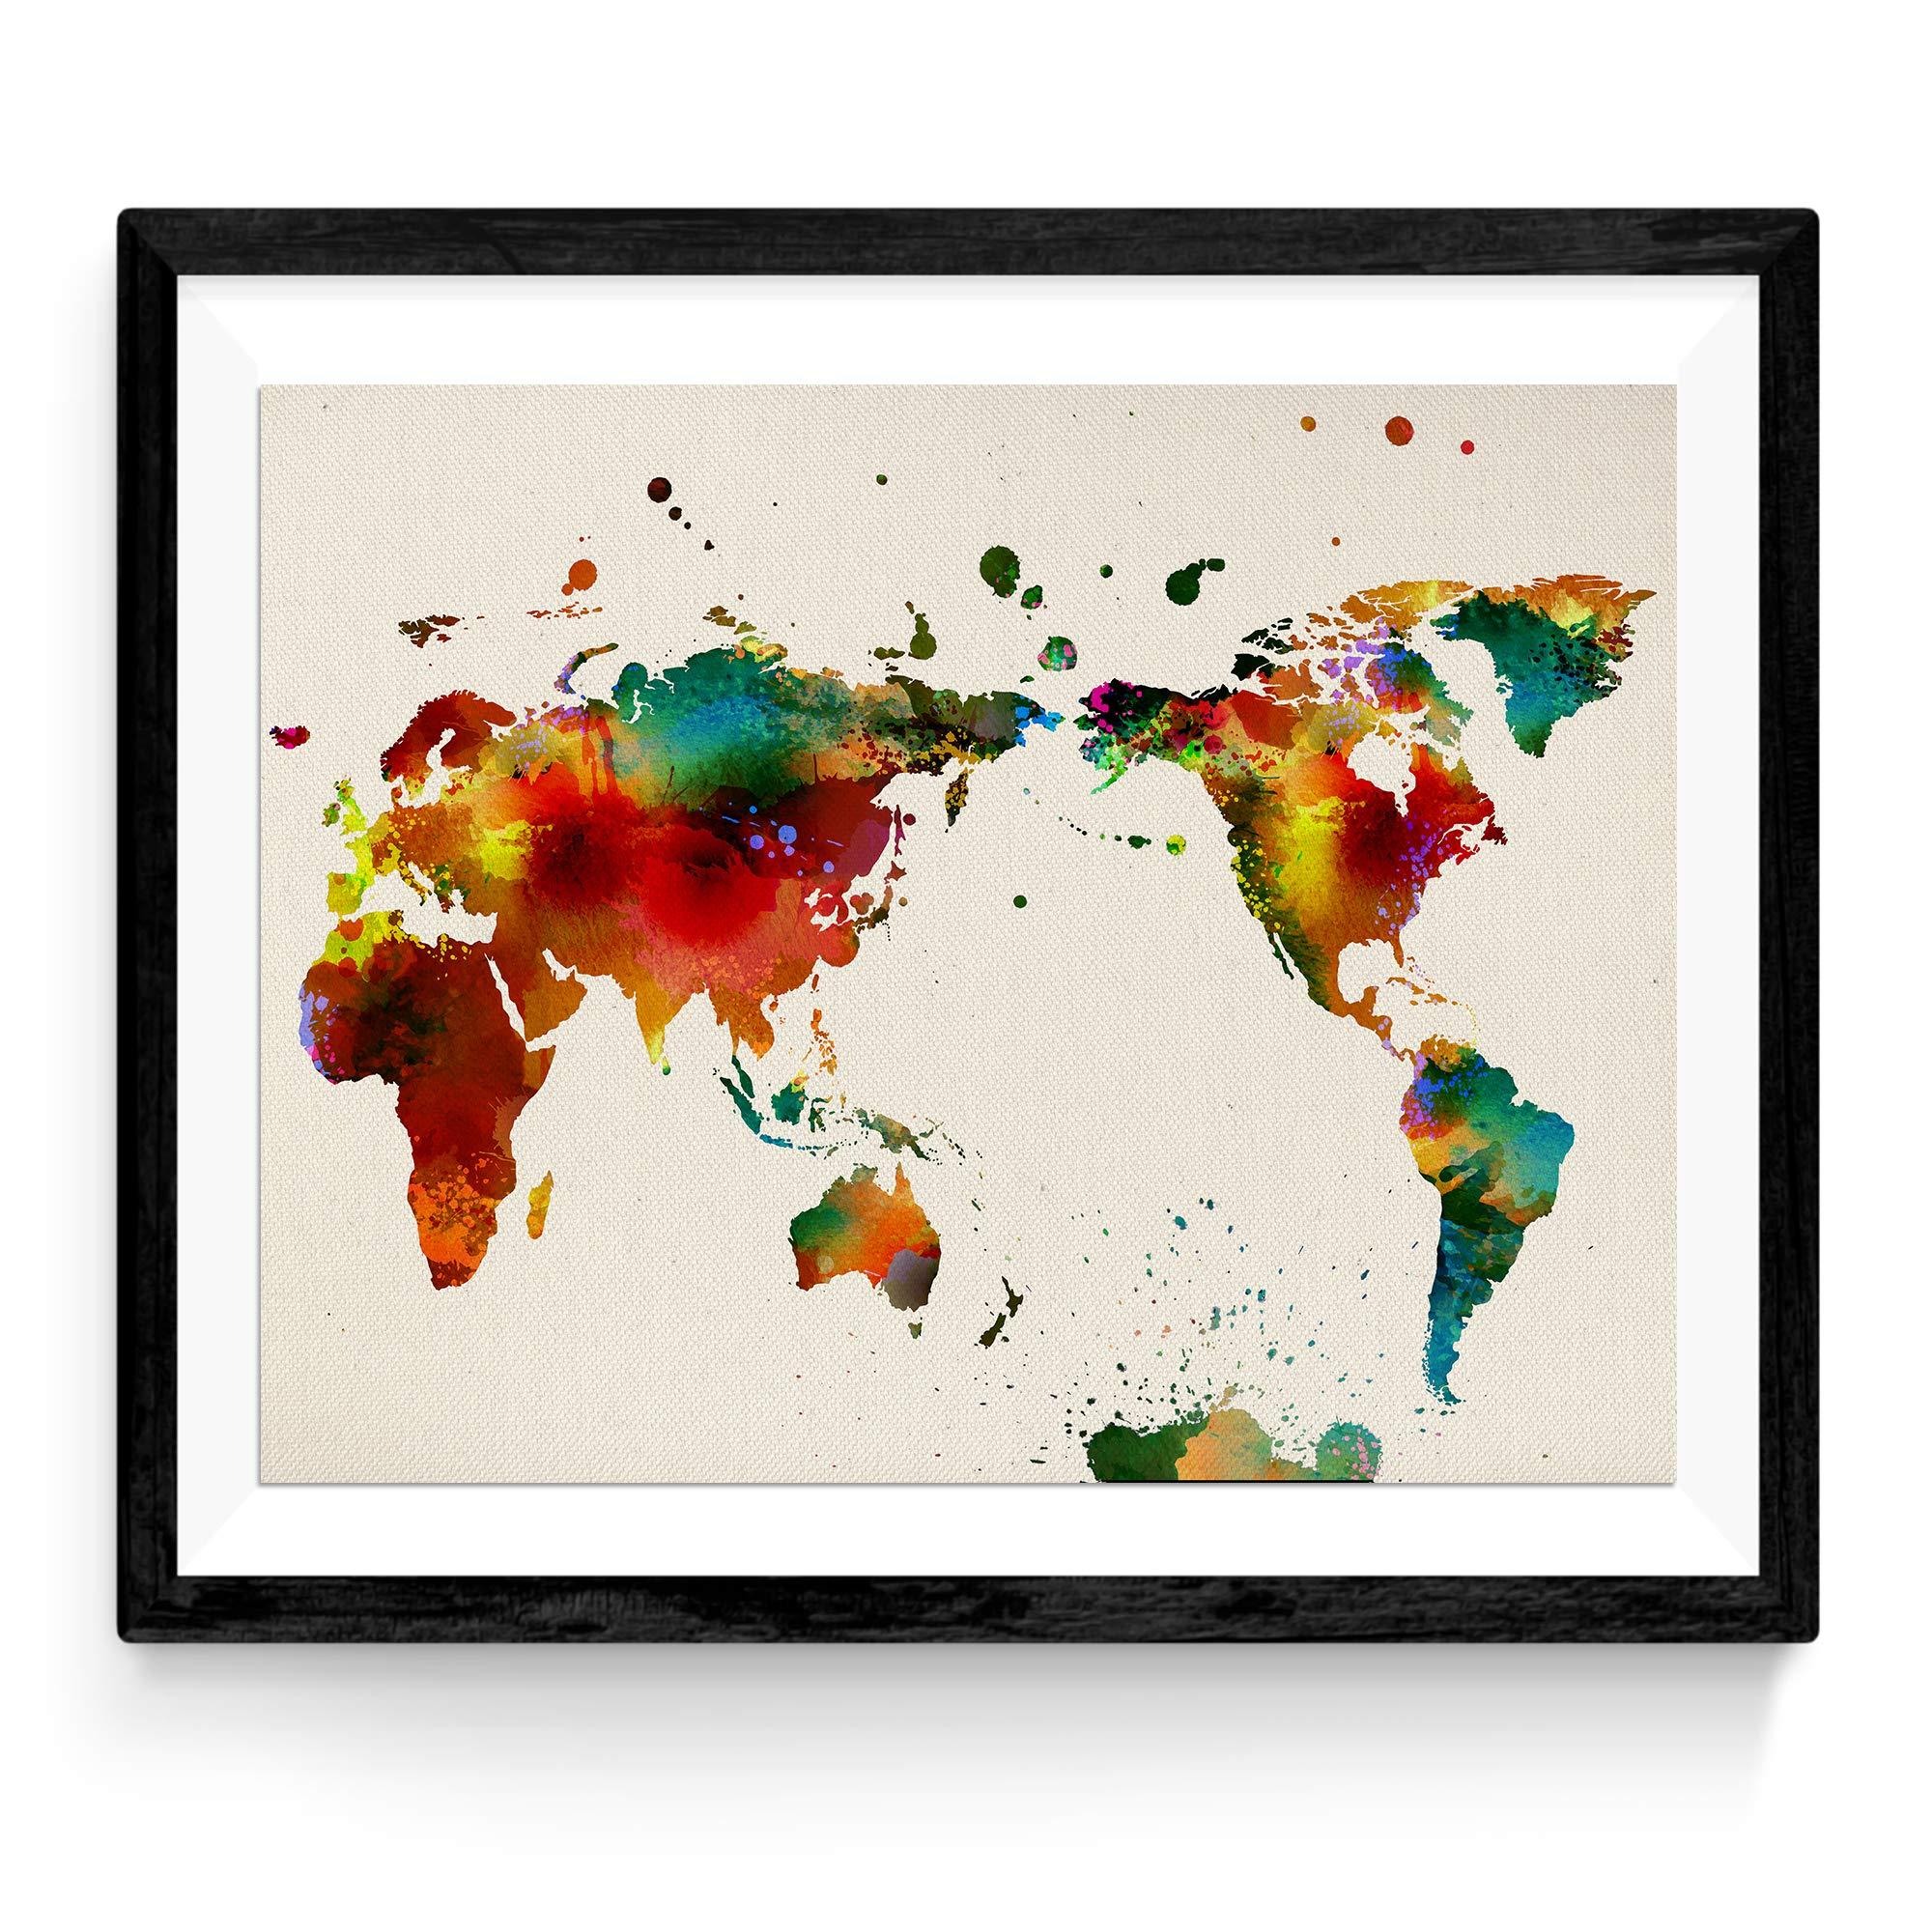 Nacnic Lámina para enmarcar MAPAMUNDI. Mapa del Mundo. Poster con ...